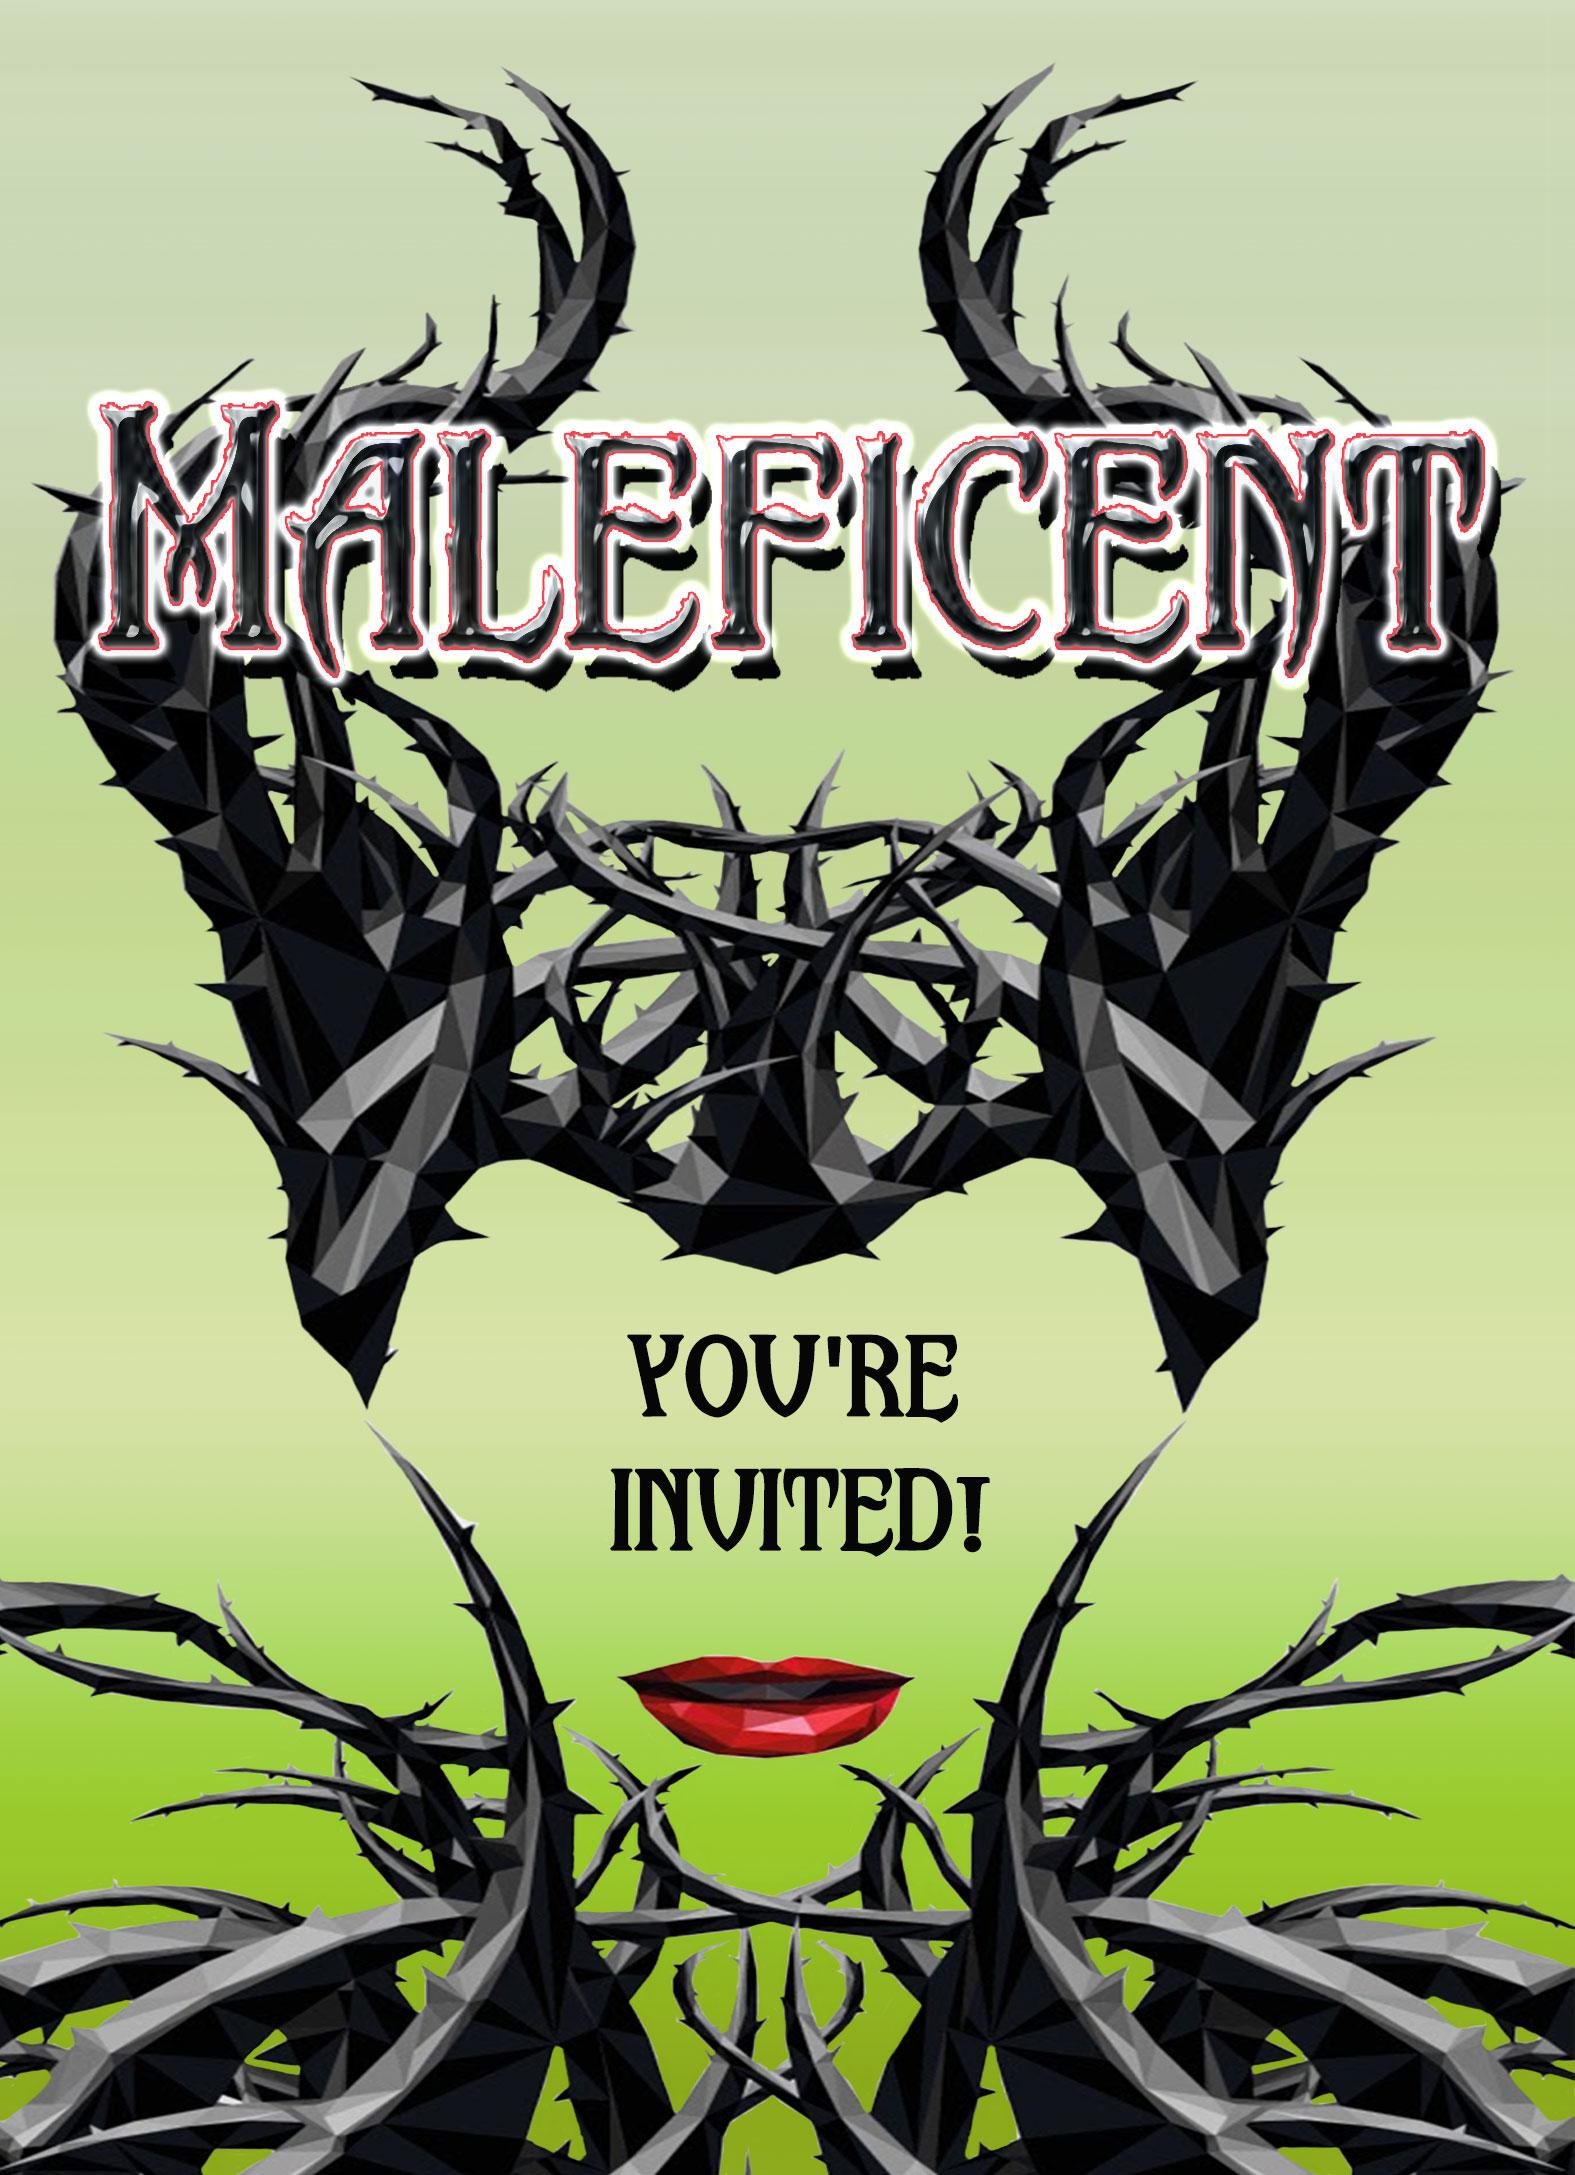 Maleficent Personalized Birthday Invitation 2 Sided Birthday Card